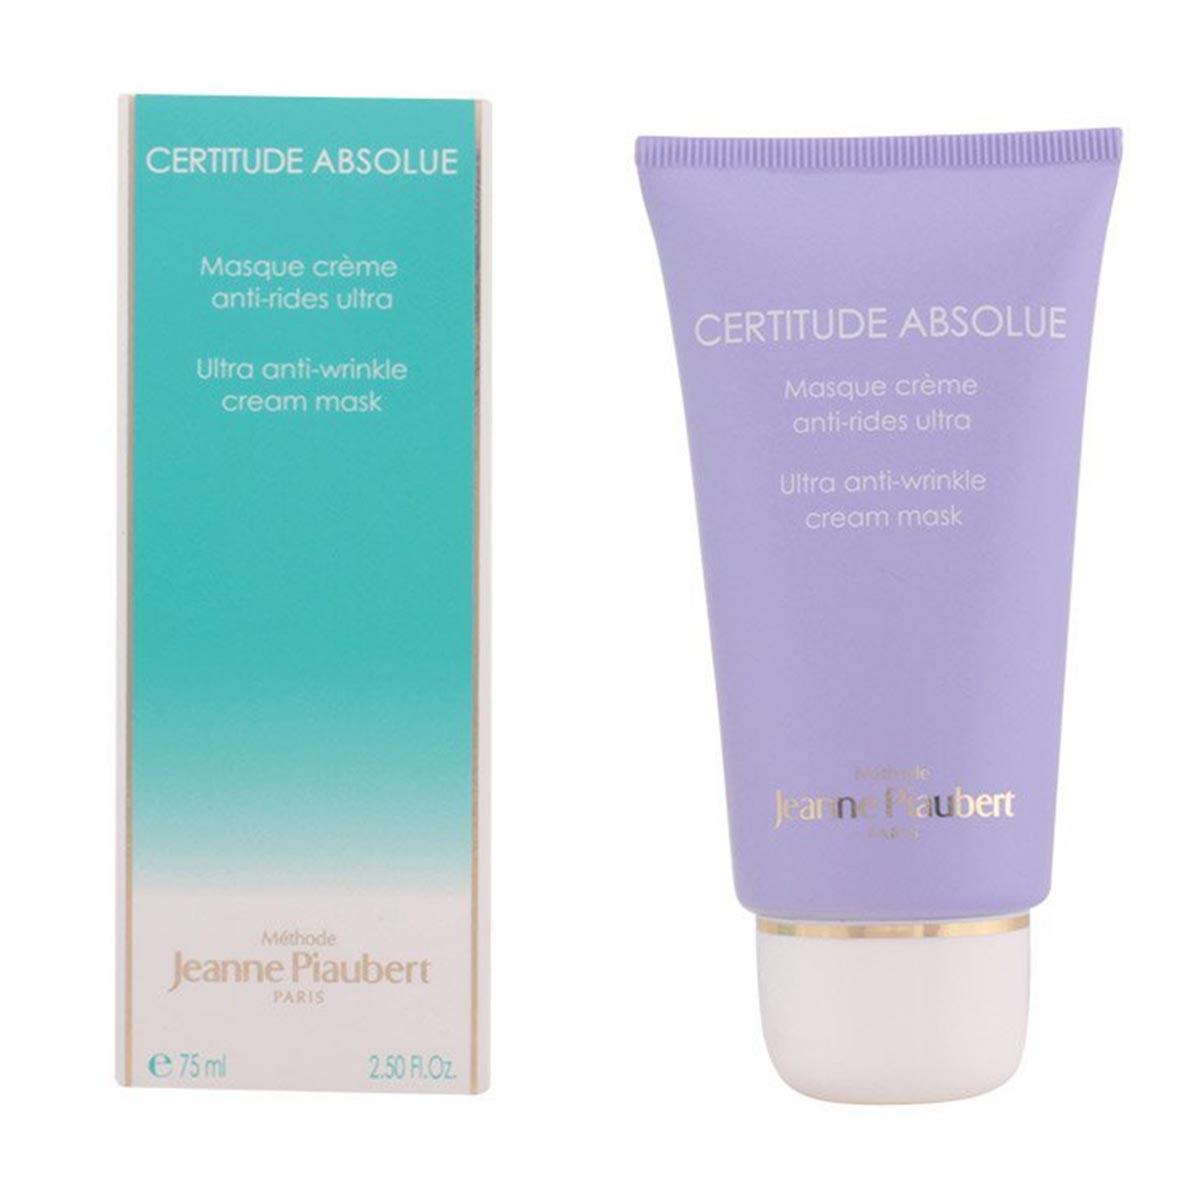 Jeanne piaubert certitude absolue ultra cream mask anti wrinkle 75ml